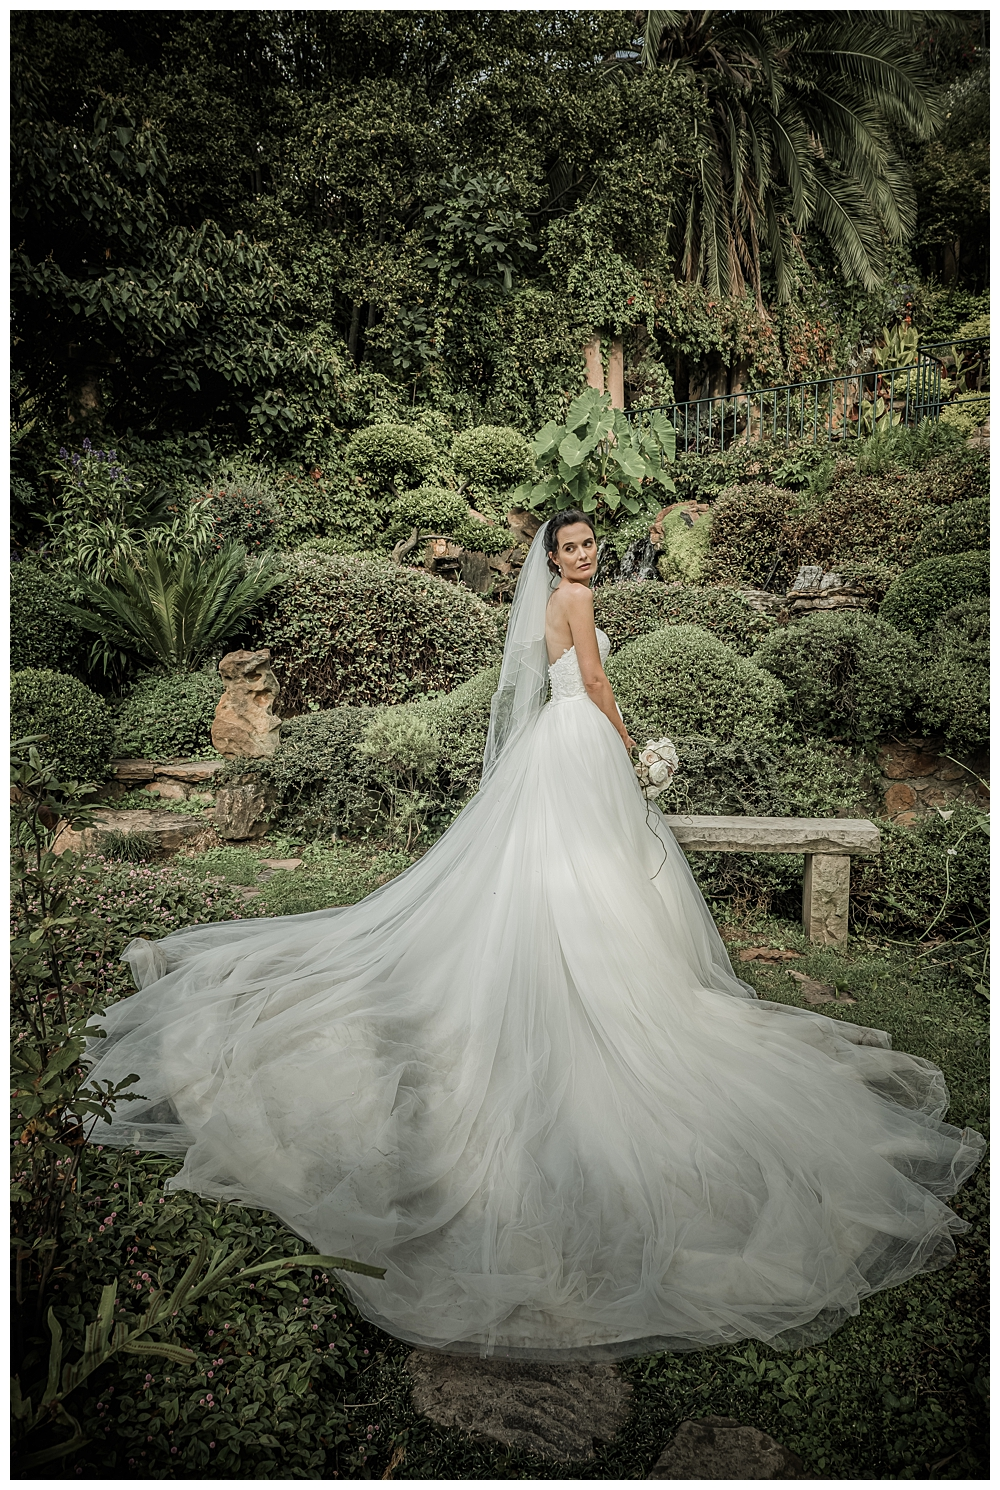 Best_Wedding_Photographer_AlexanderSmith_1280.jpg